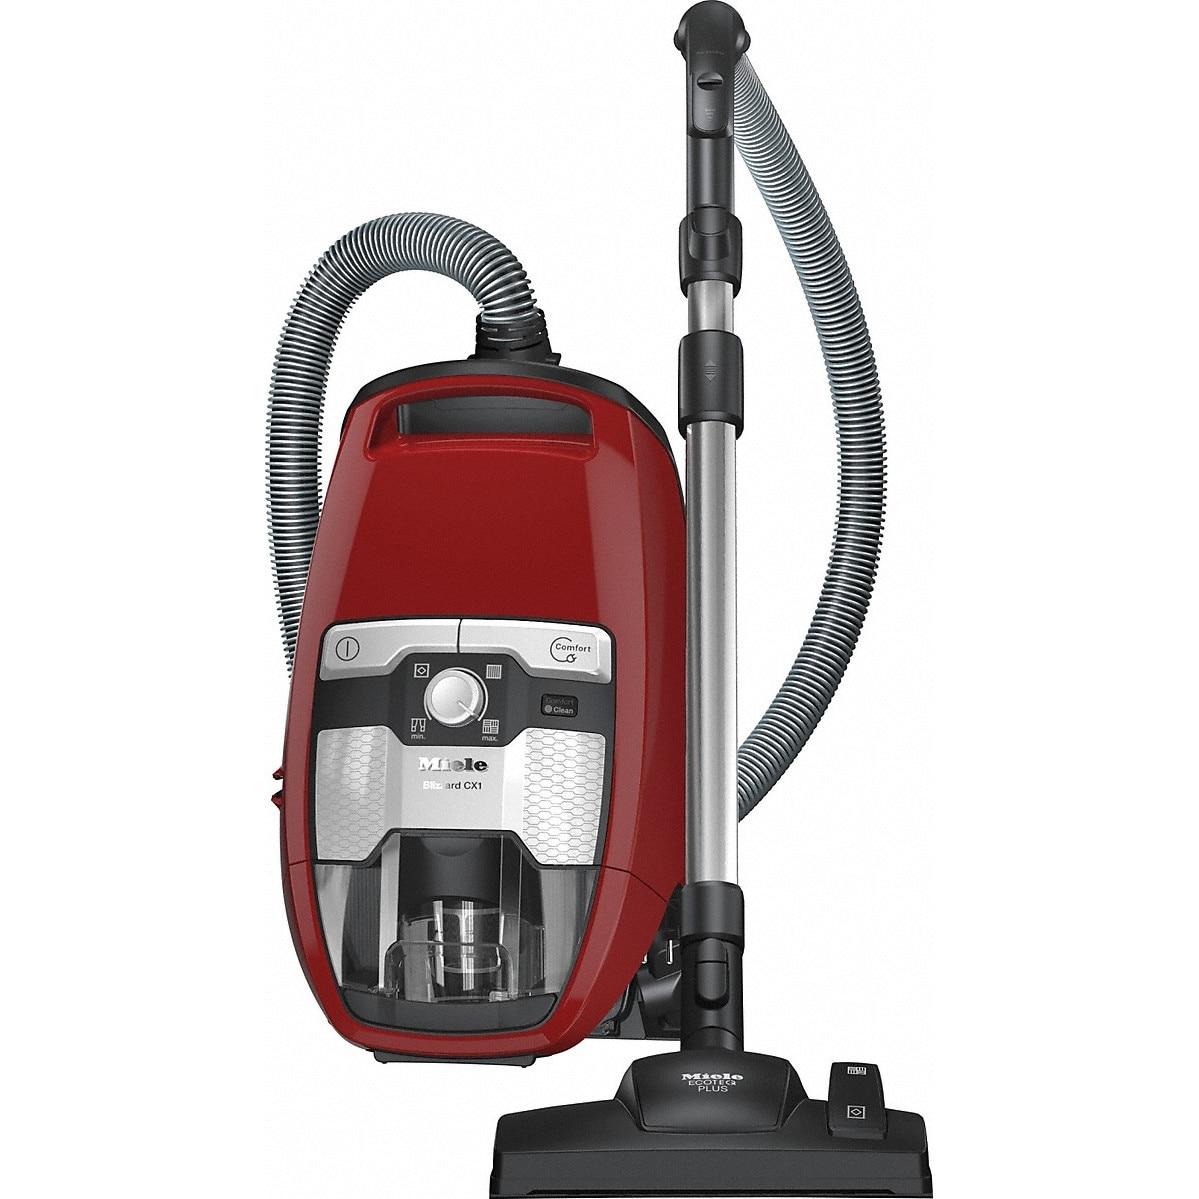 Fotografie Aspirator fara sac Miele Blizzard CX1 Red PowerLine SKRF3, 890 W, Perie universala, 77 dB, 2 L, Rosu